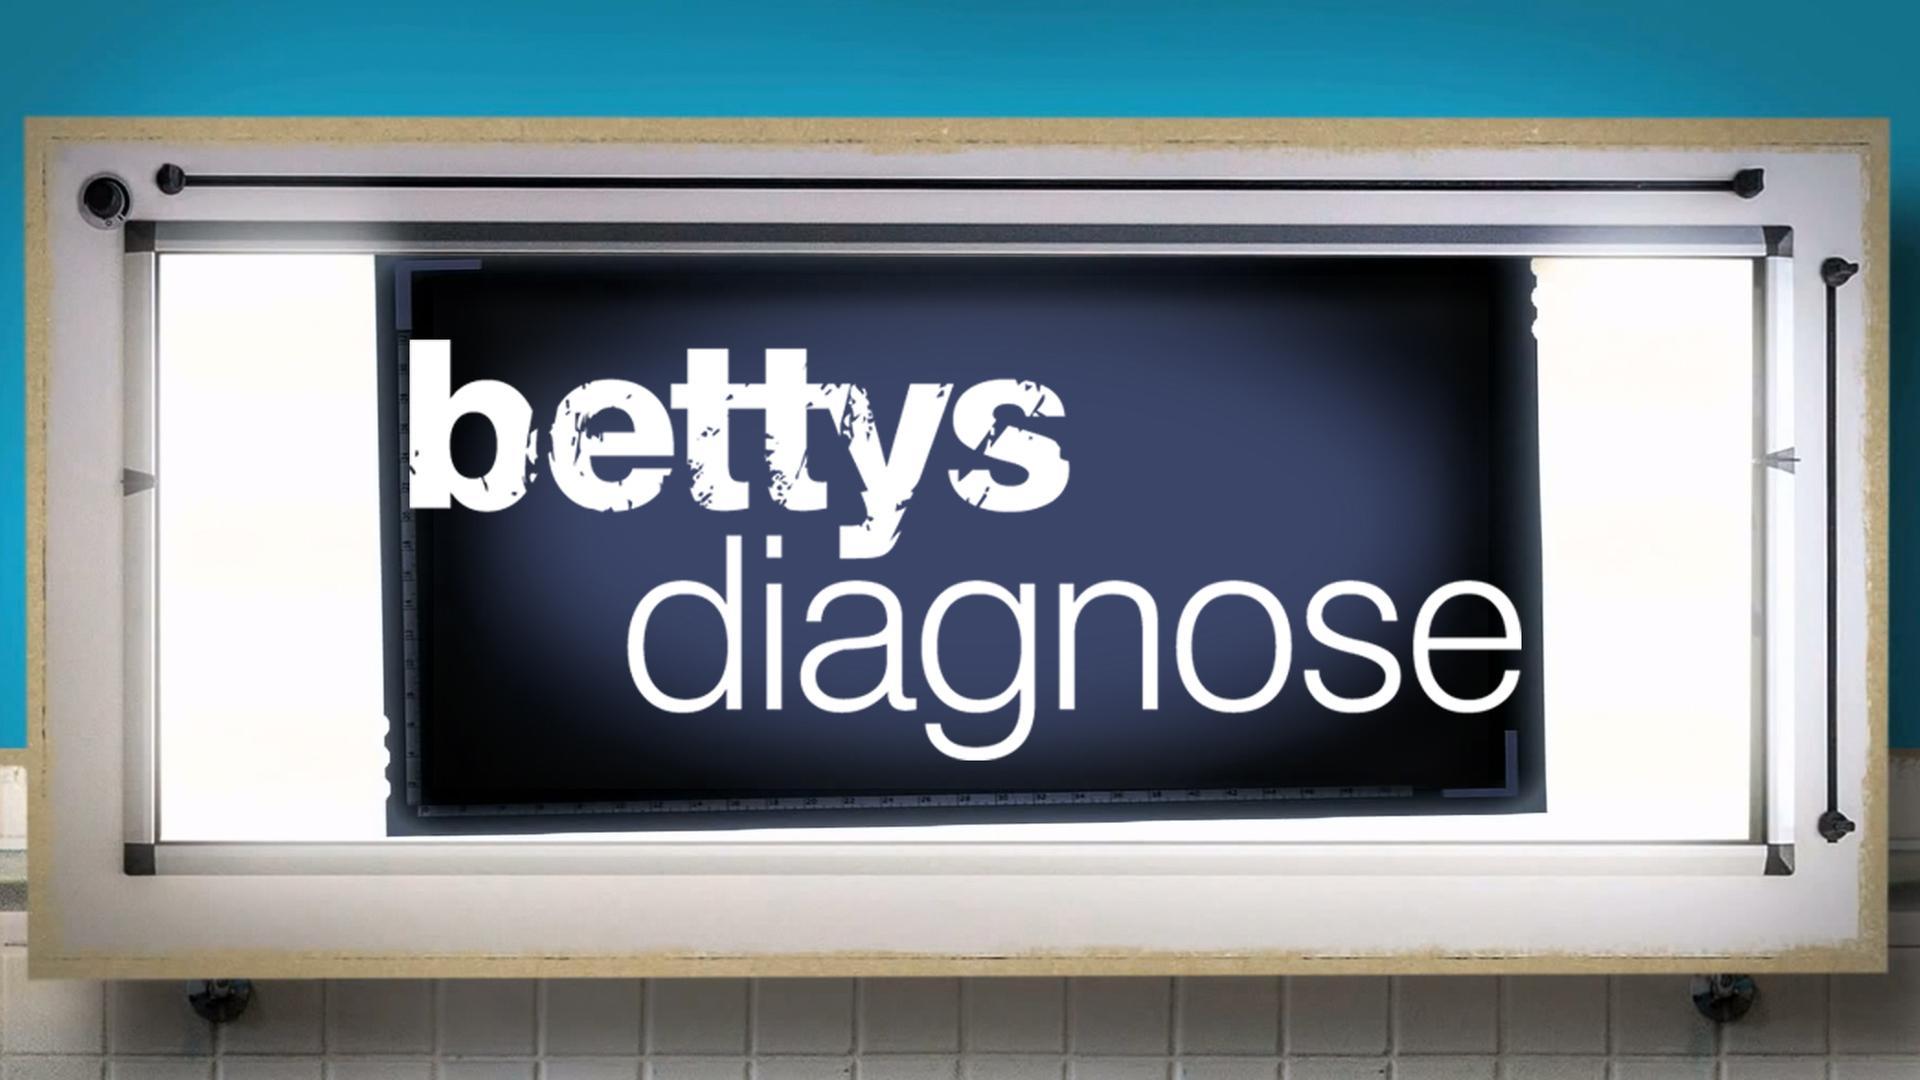 Betty's diagnosis